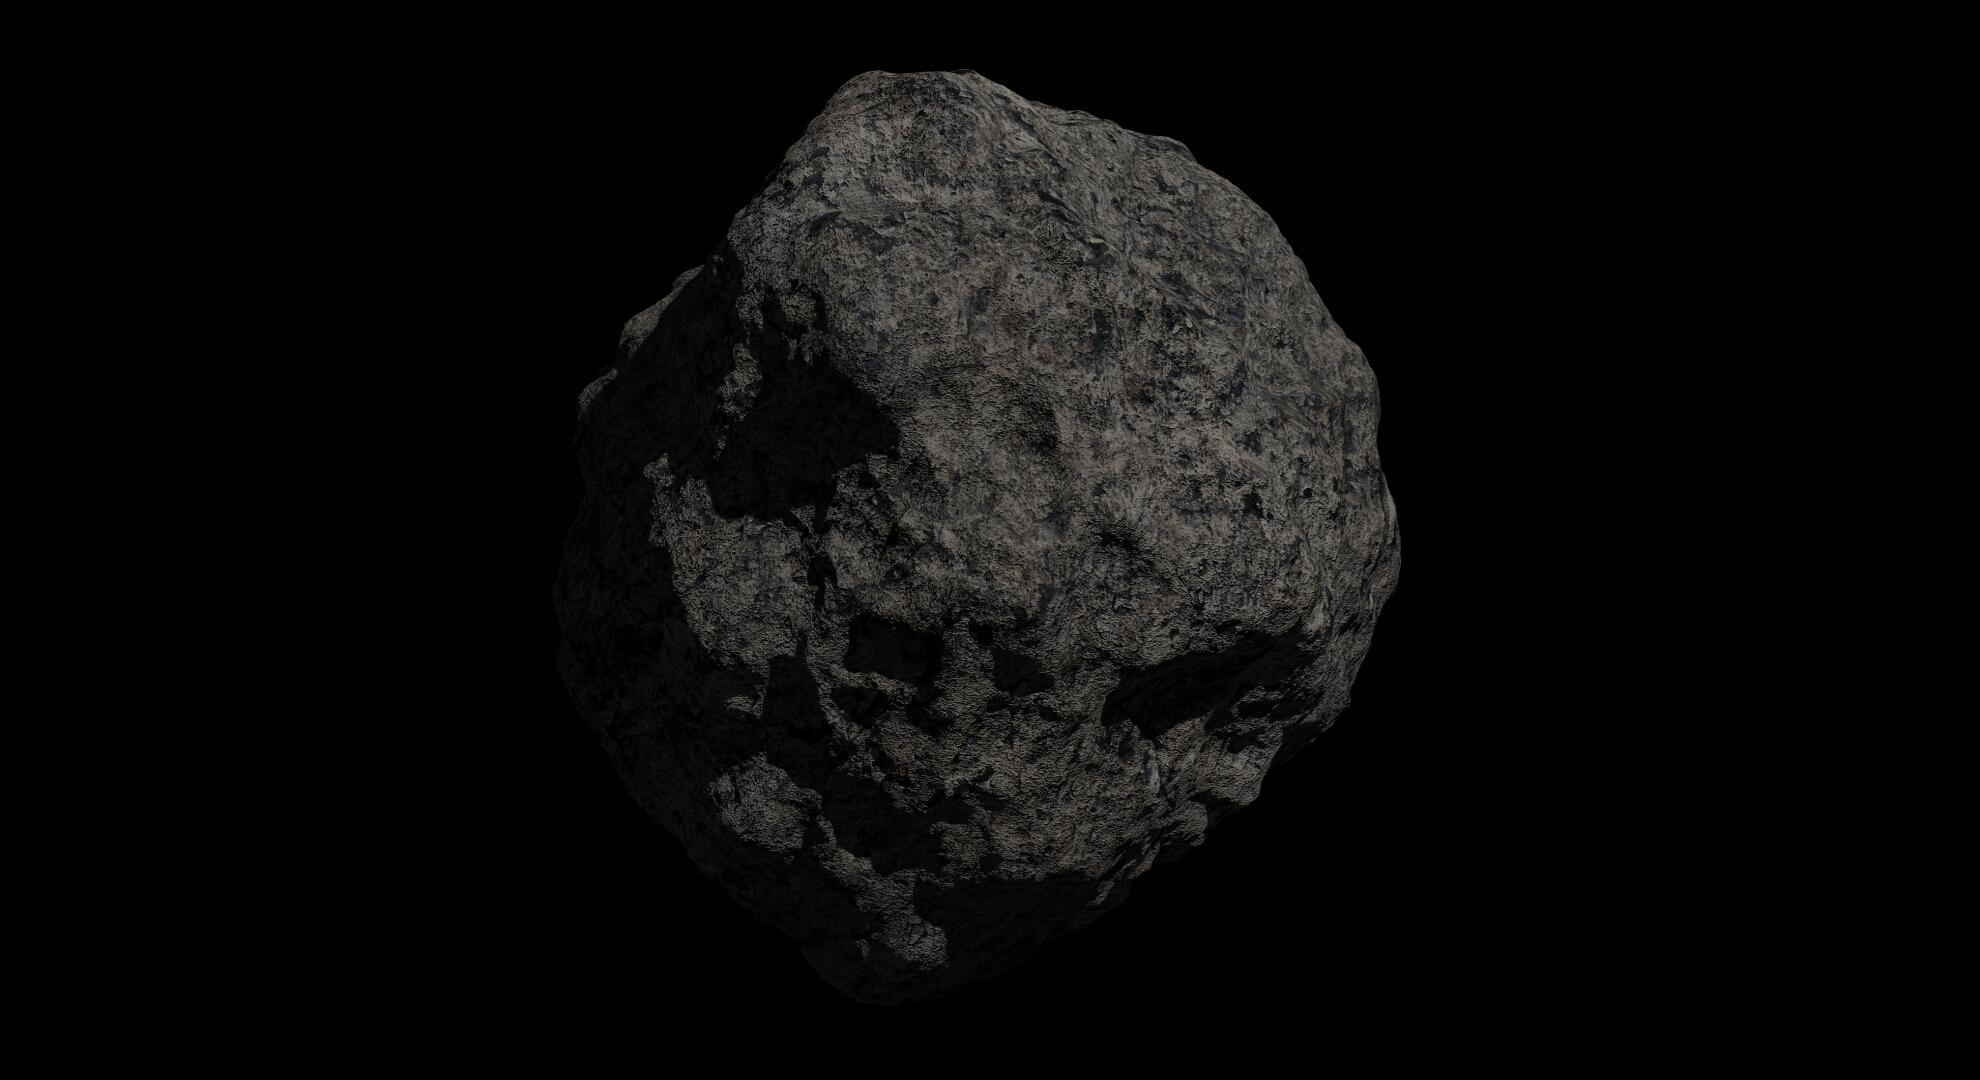 fantasy asteroid 2 3d model 3ds blend dae fbx obj 267193